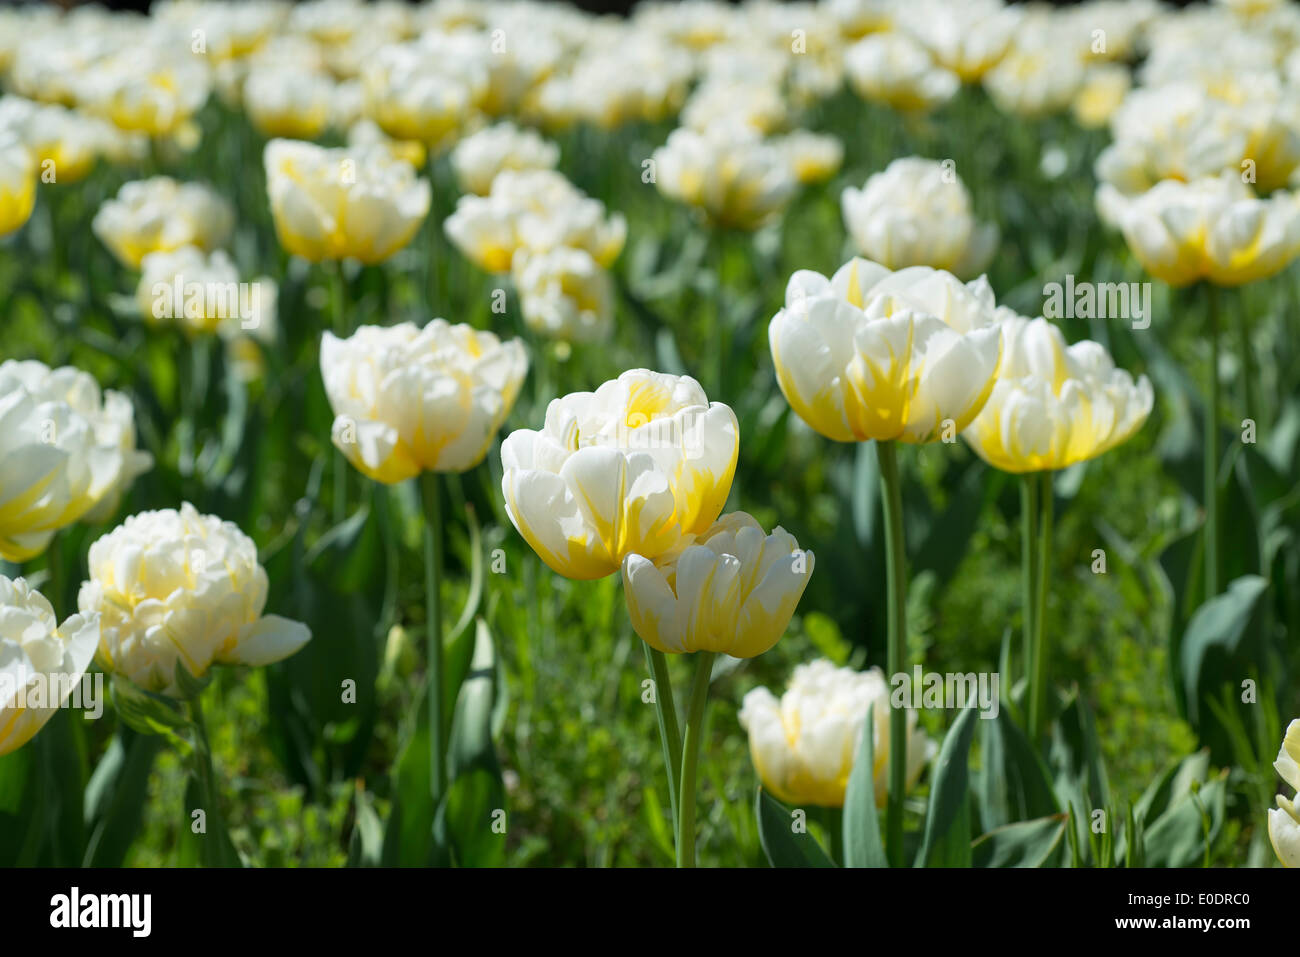 Tulip Tulipa 'Flaming Evita' - Stock Image